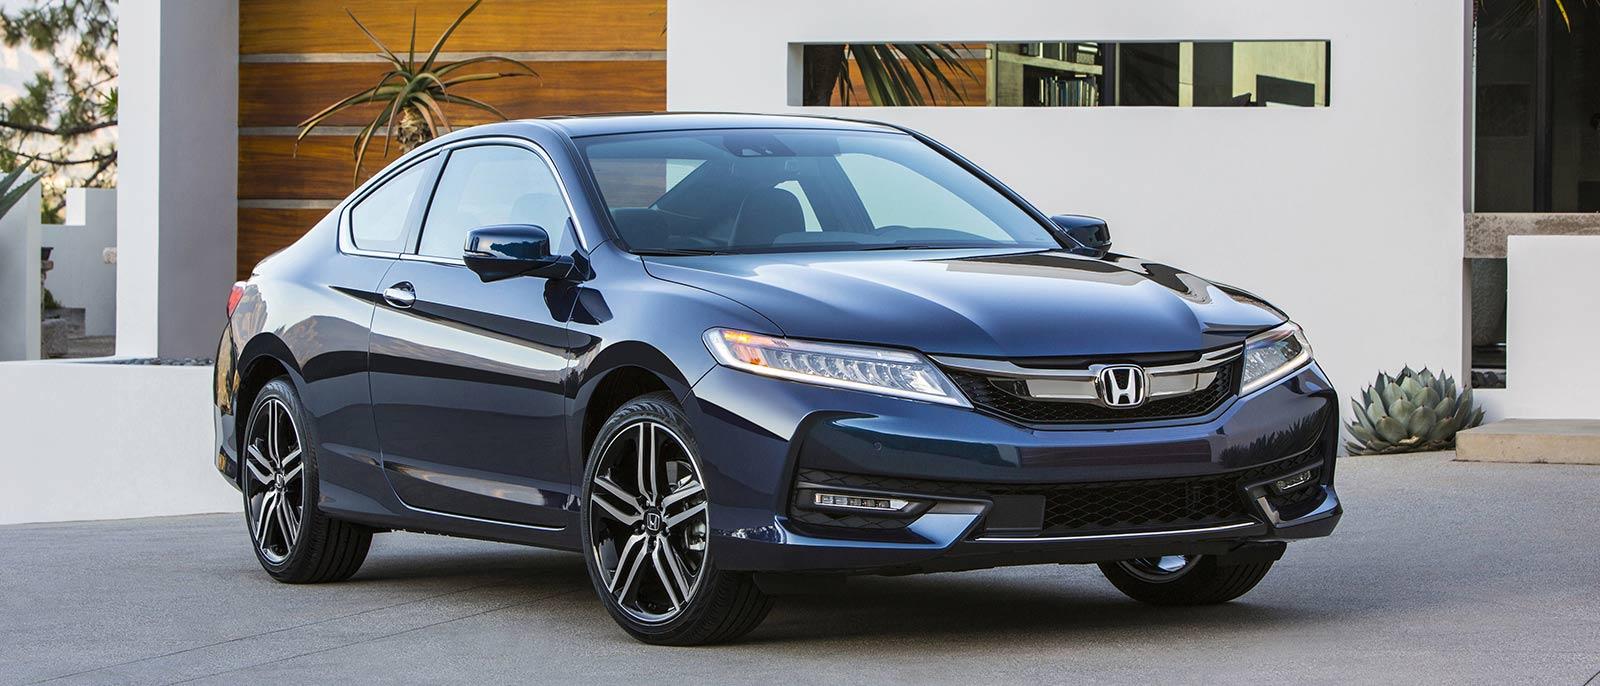 Honda Accord 0 60 >> 2015 Accord V6 0 To 60 | Autos Post